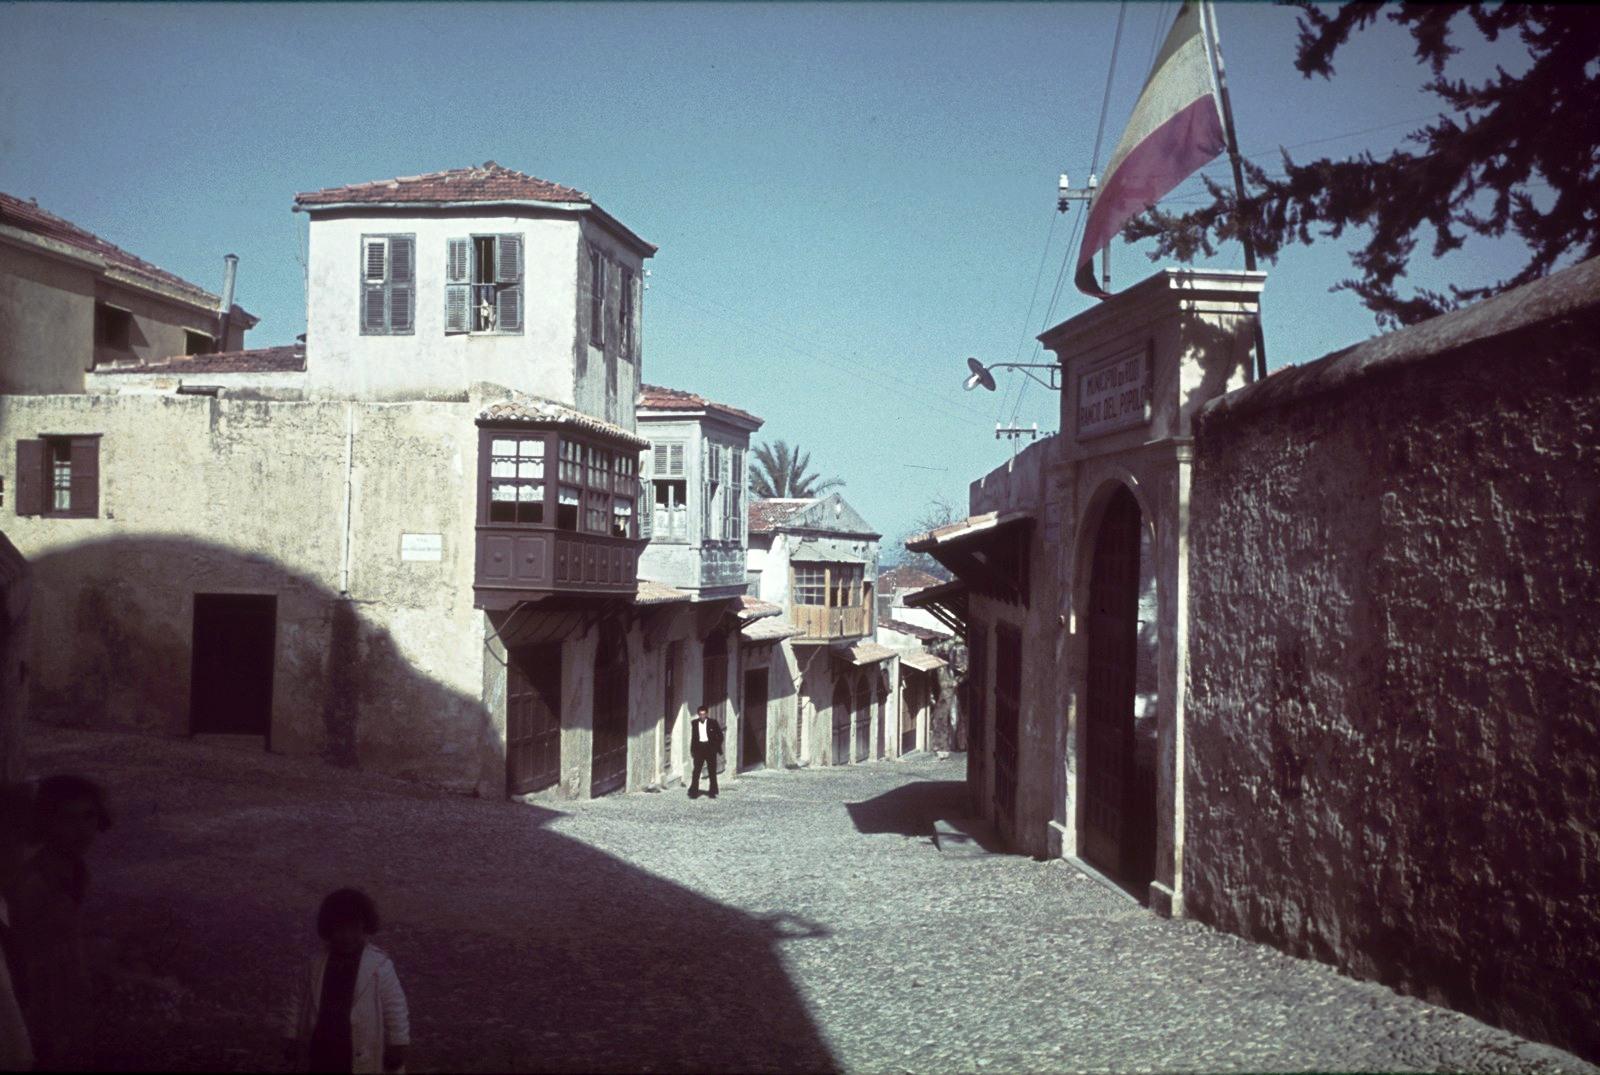 Палермо. Улица в городе